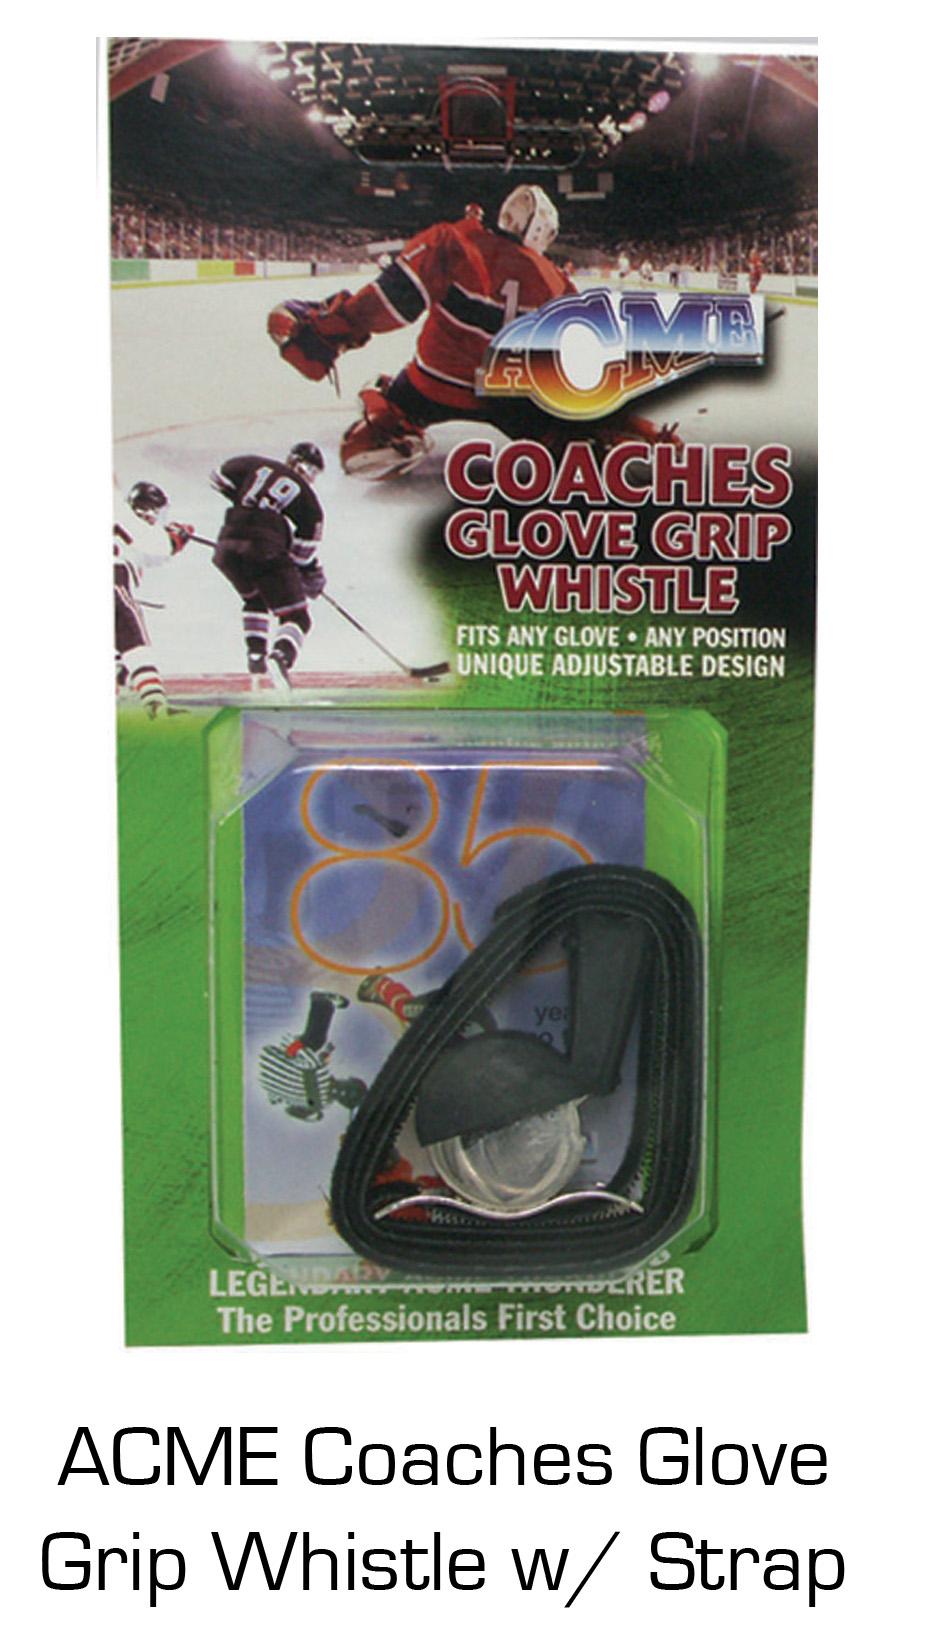 ACME Coaches Glove Grip Whistle